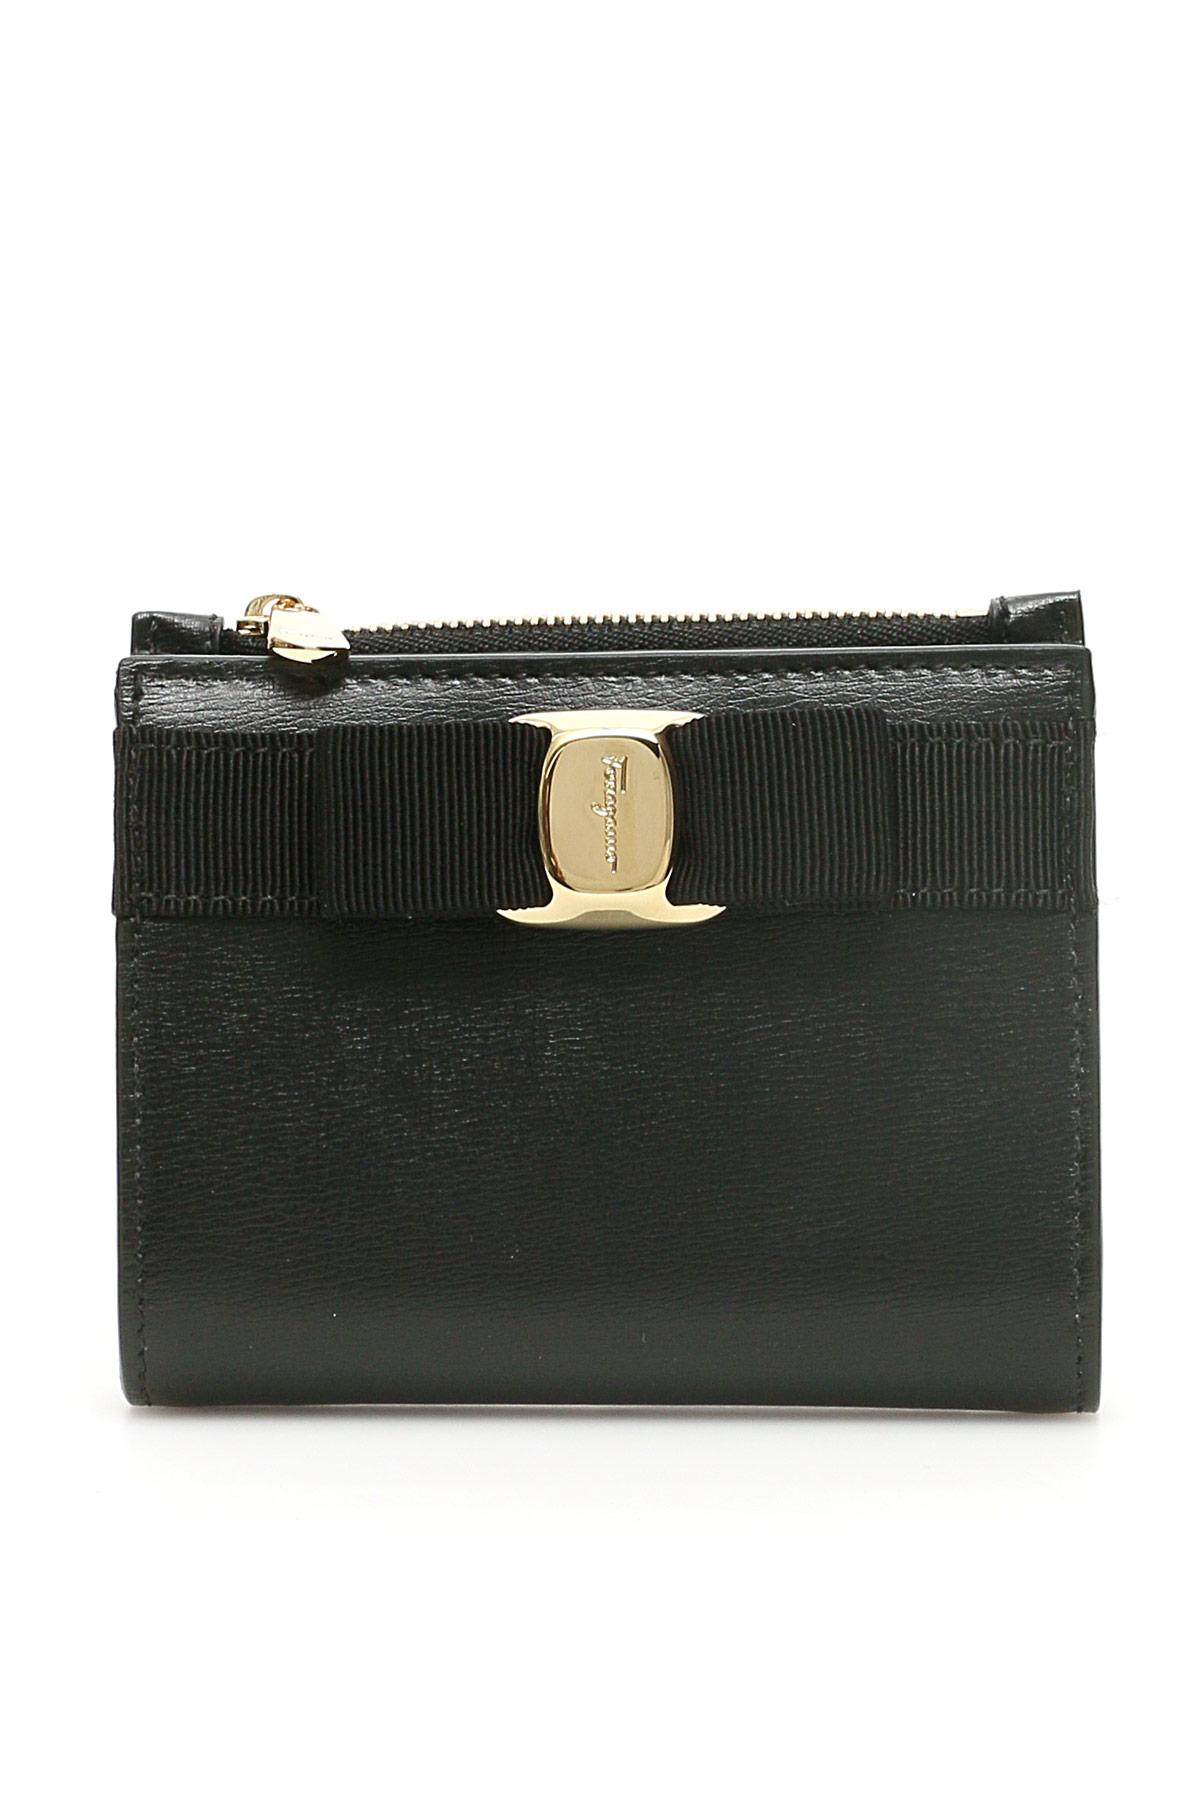 SALVATORE FERRAGAMO NEW VARA WALLET OS Black Leather